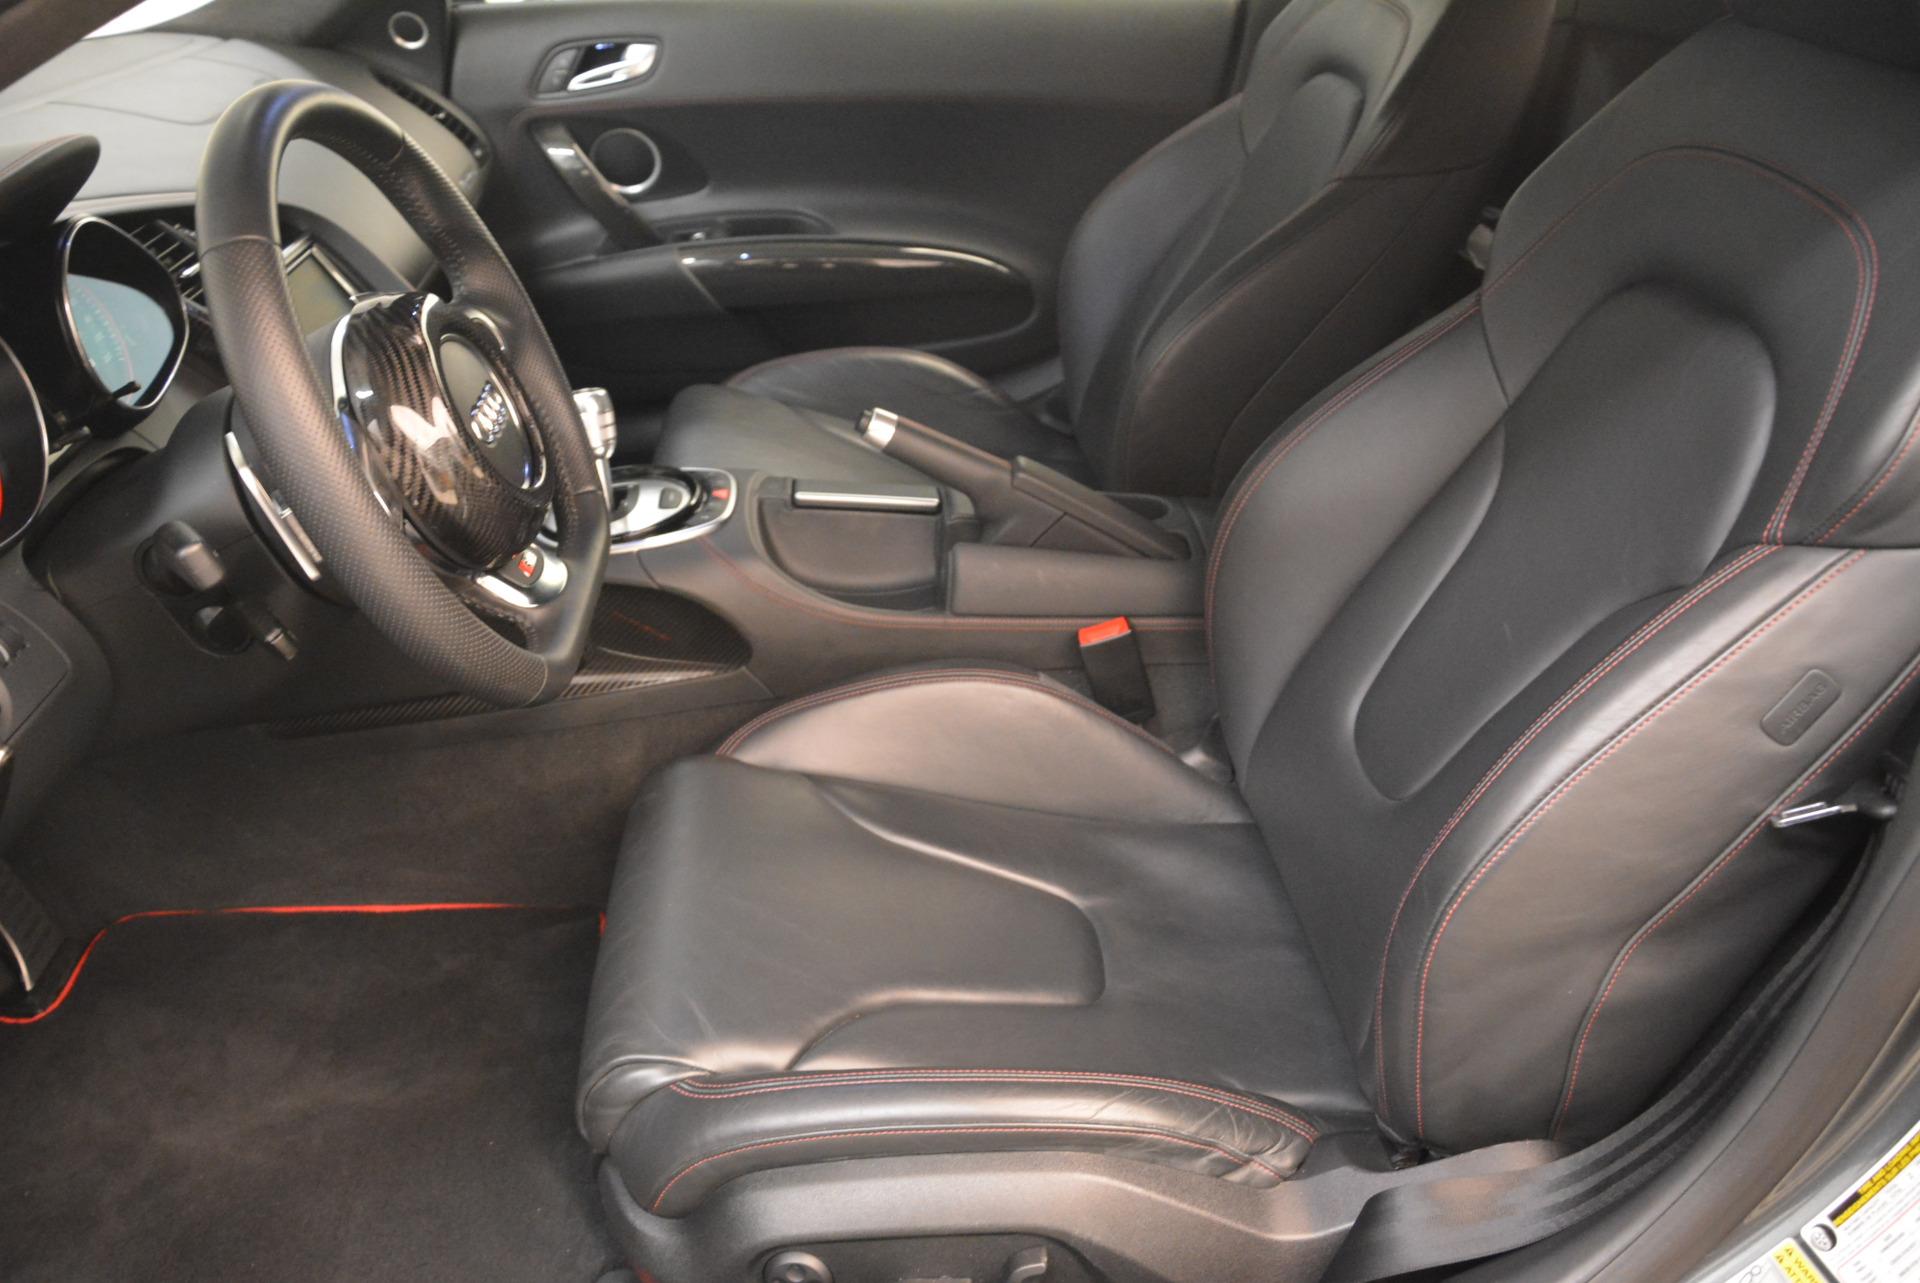 Used 2014 Audi R8 5.2 quattro For Sale In Greenwich, CT 2147_p15